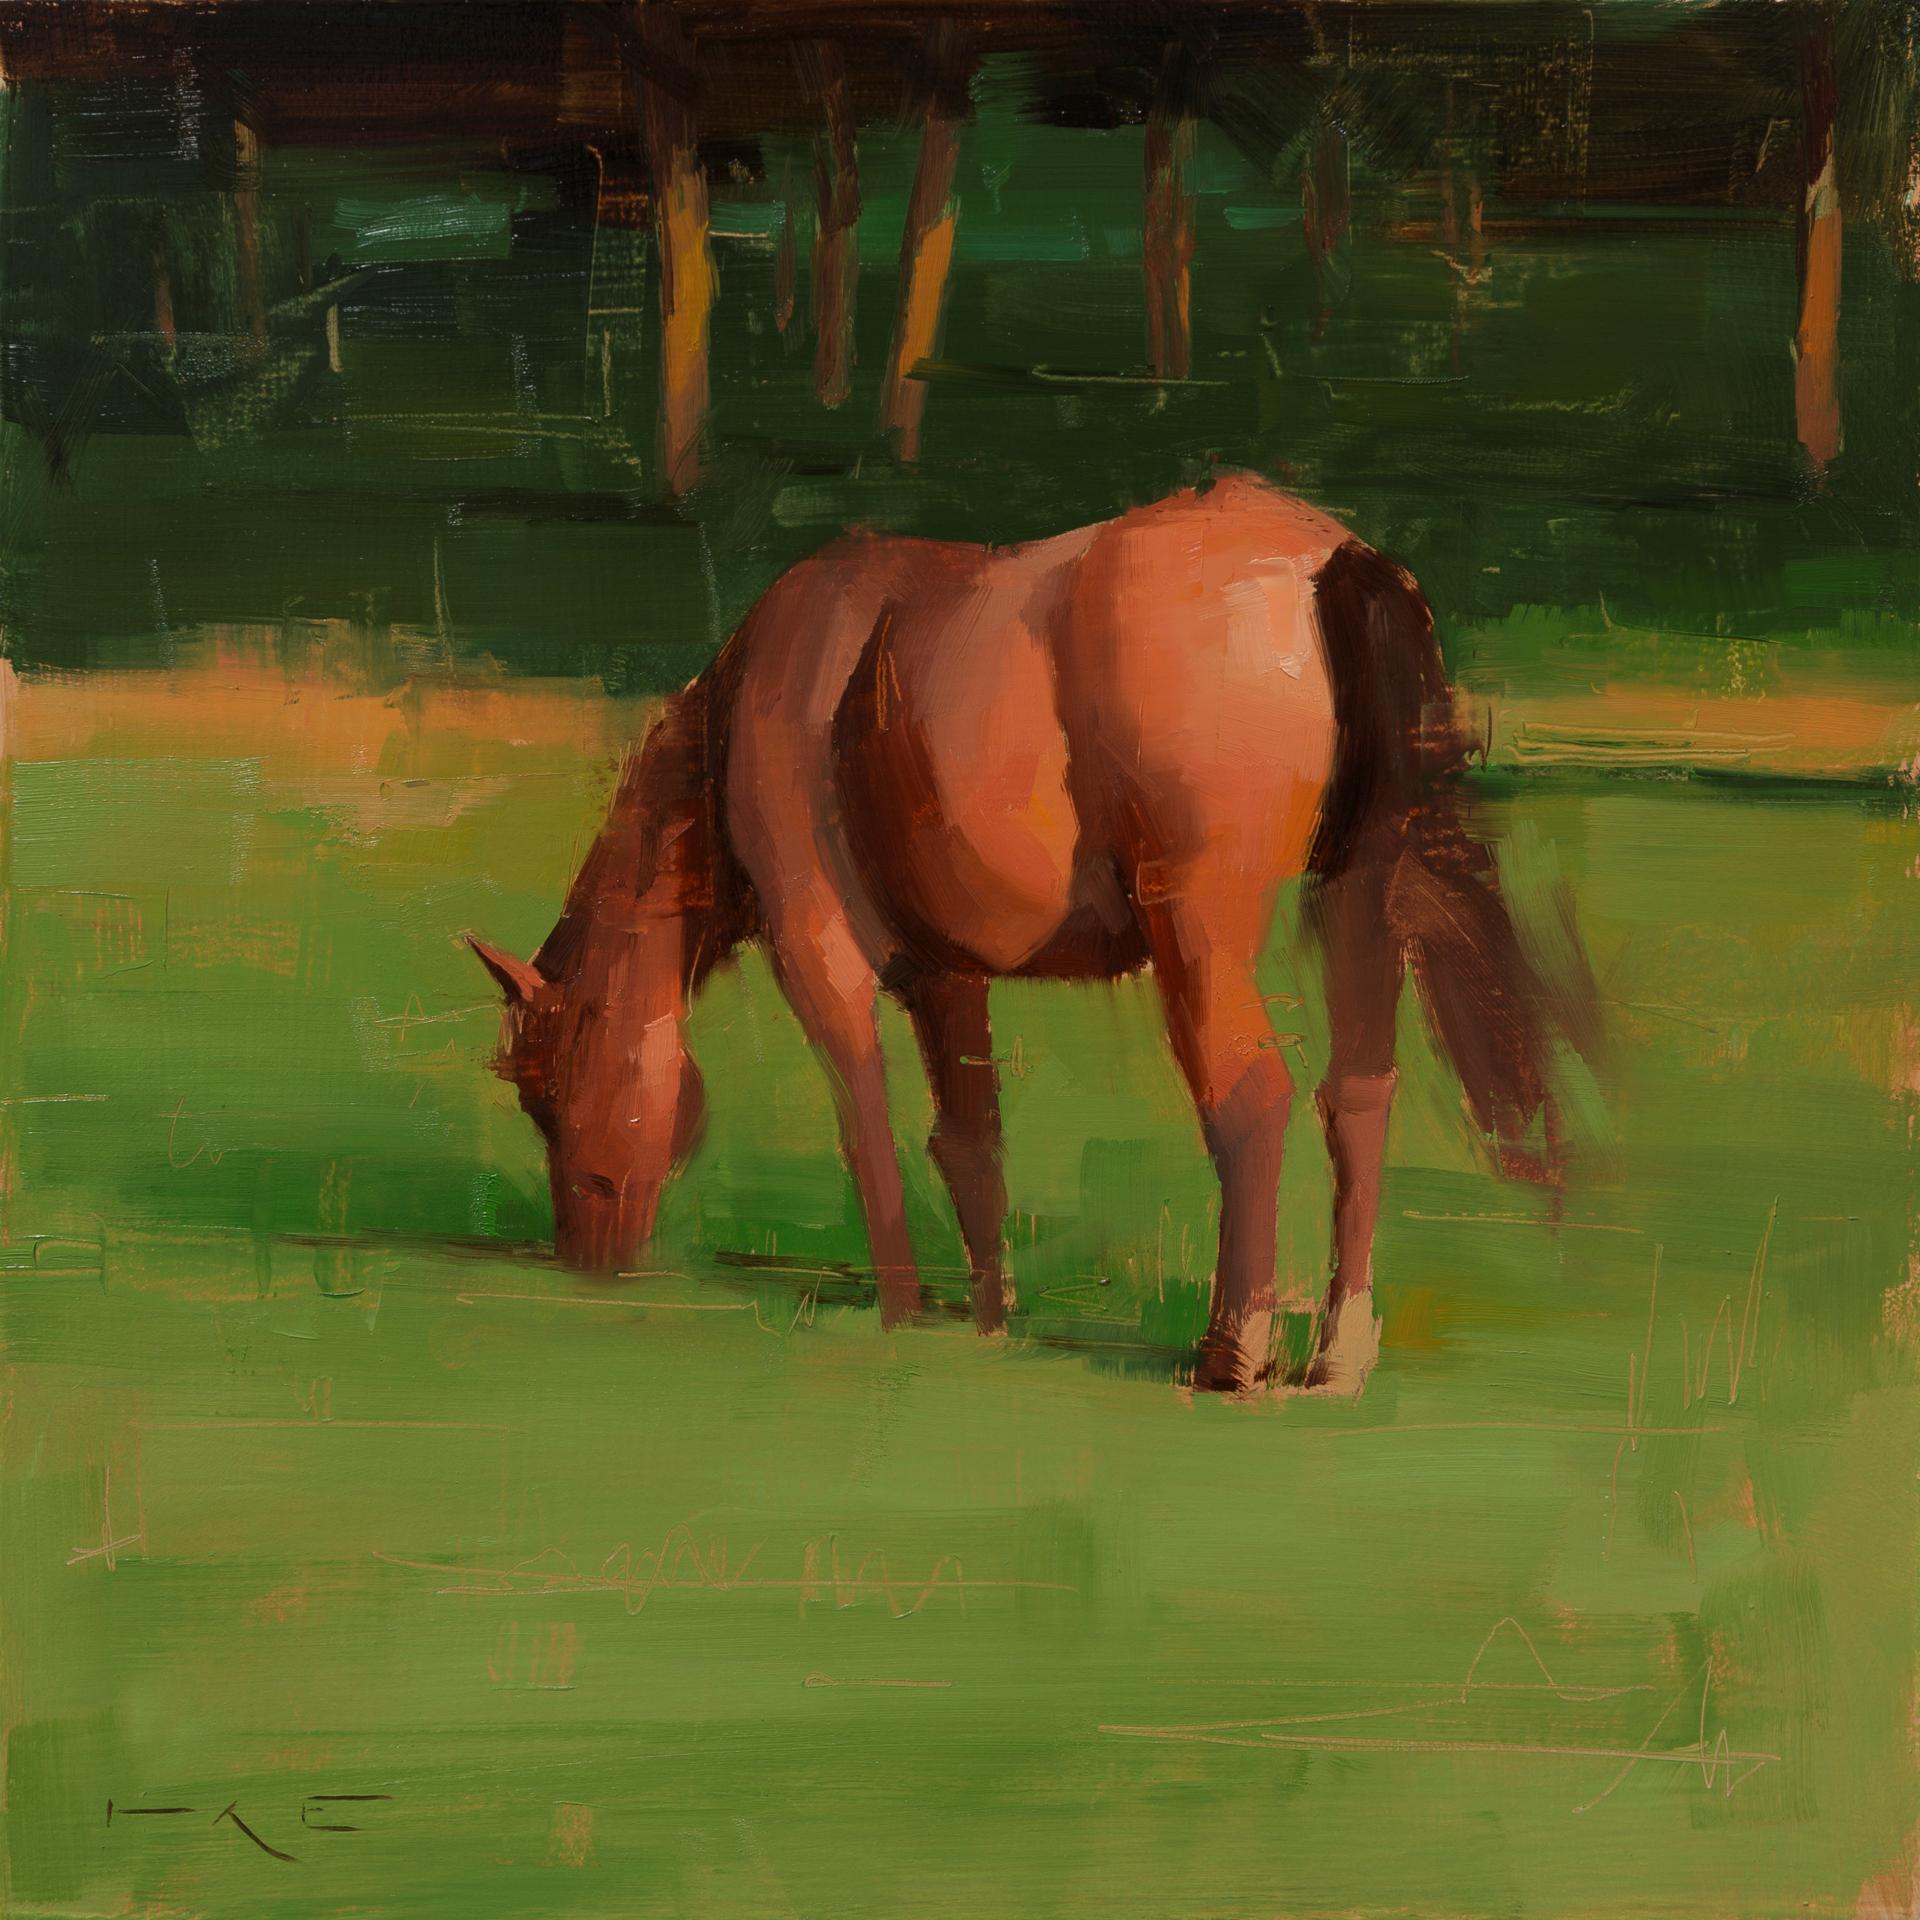 American Horse 2 by Thorgrimur Einarsson